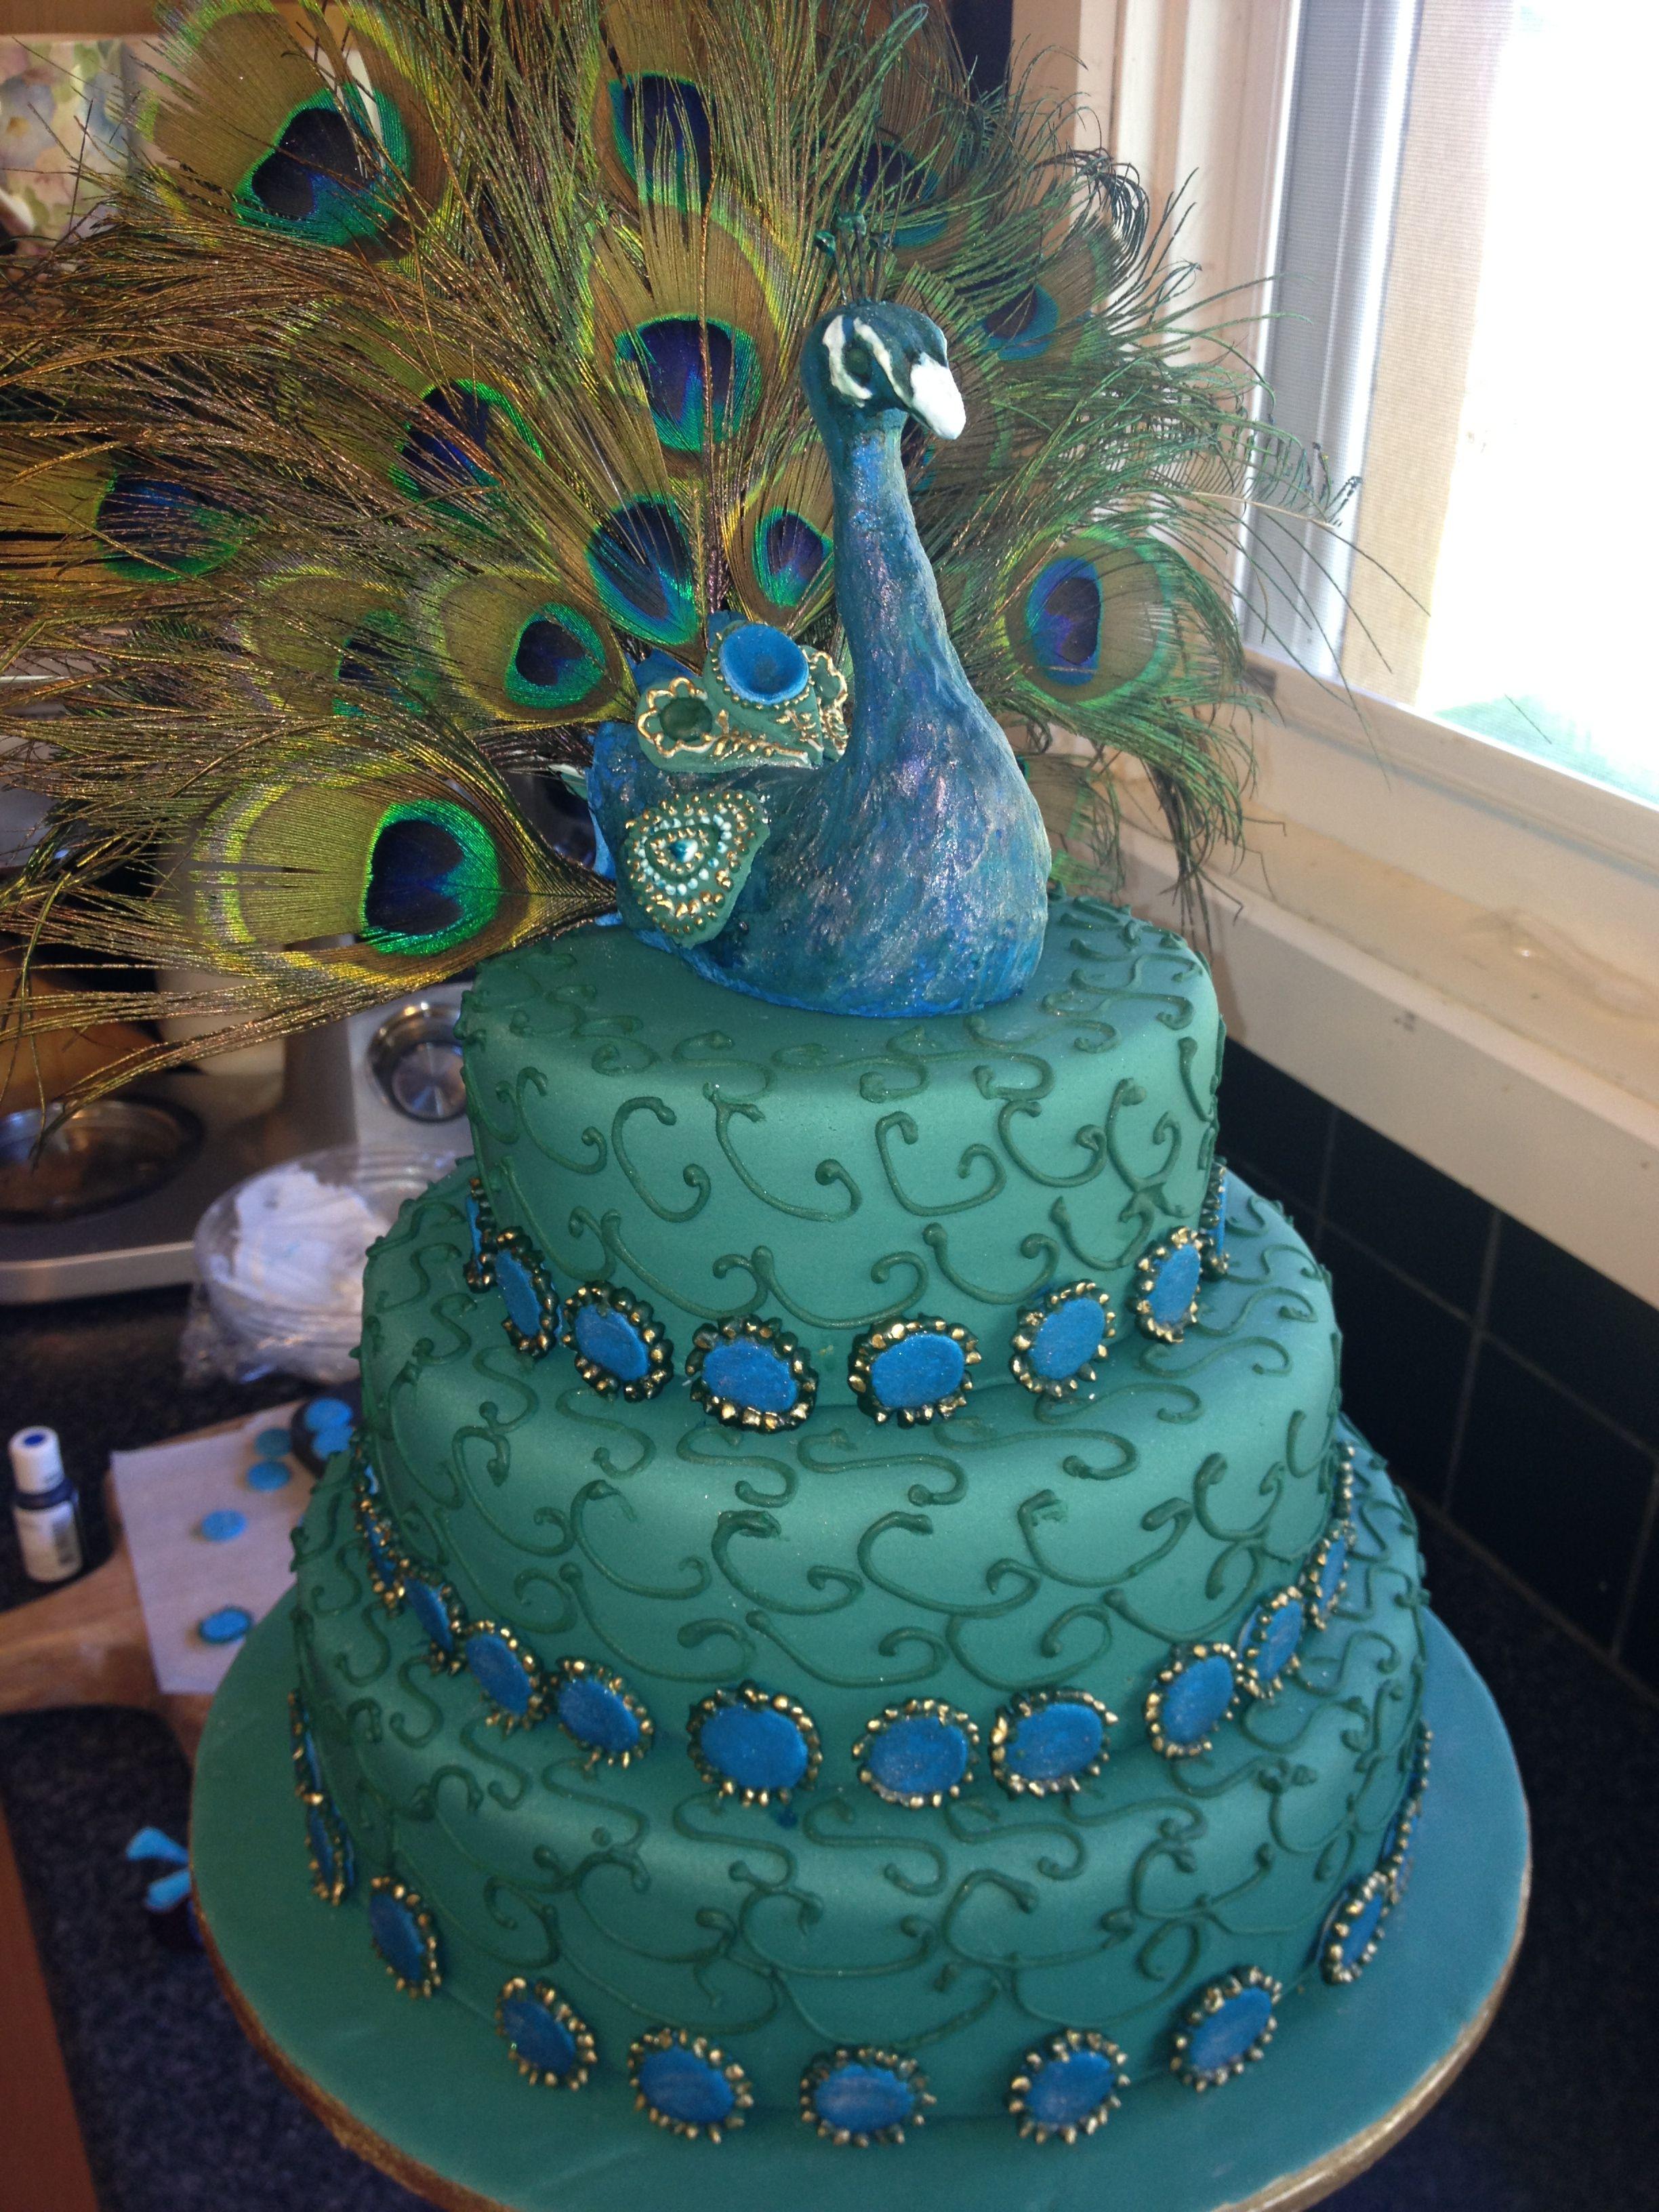 Peacock Wedding Cake.My Peacock Cake Cake Wedding Peacock Wedding Cake